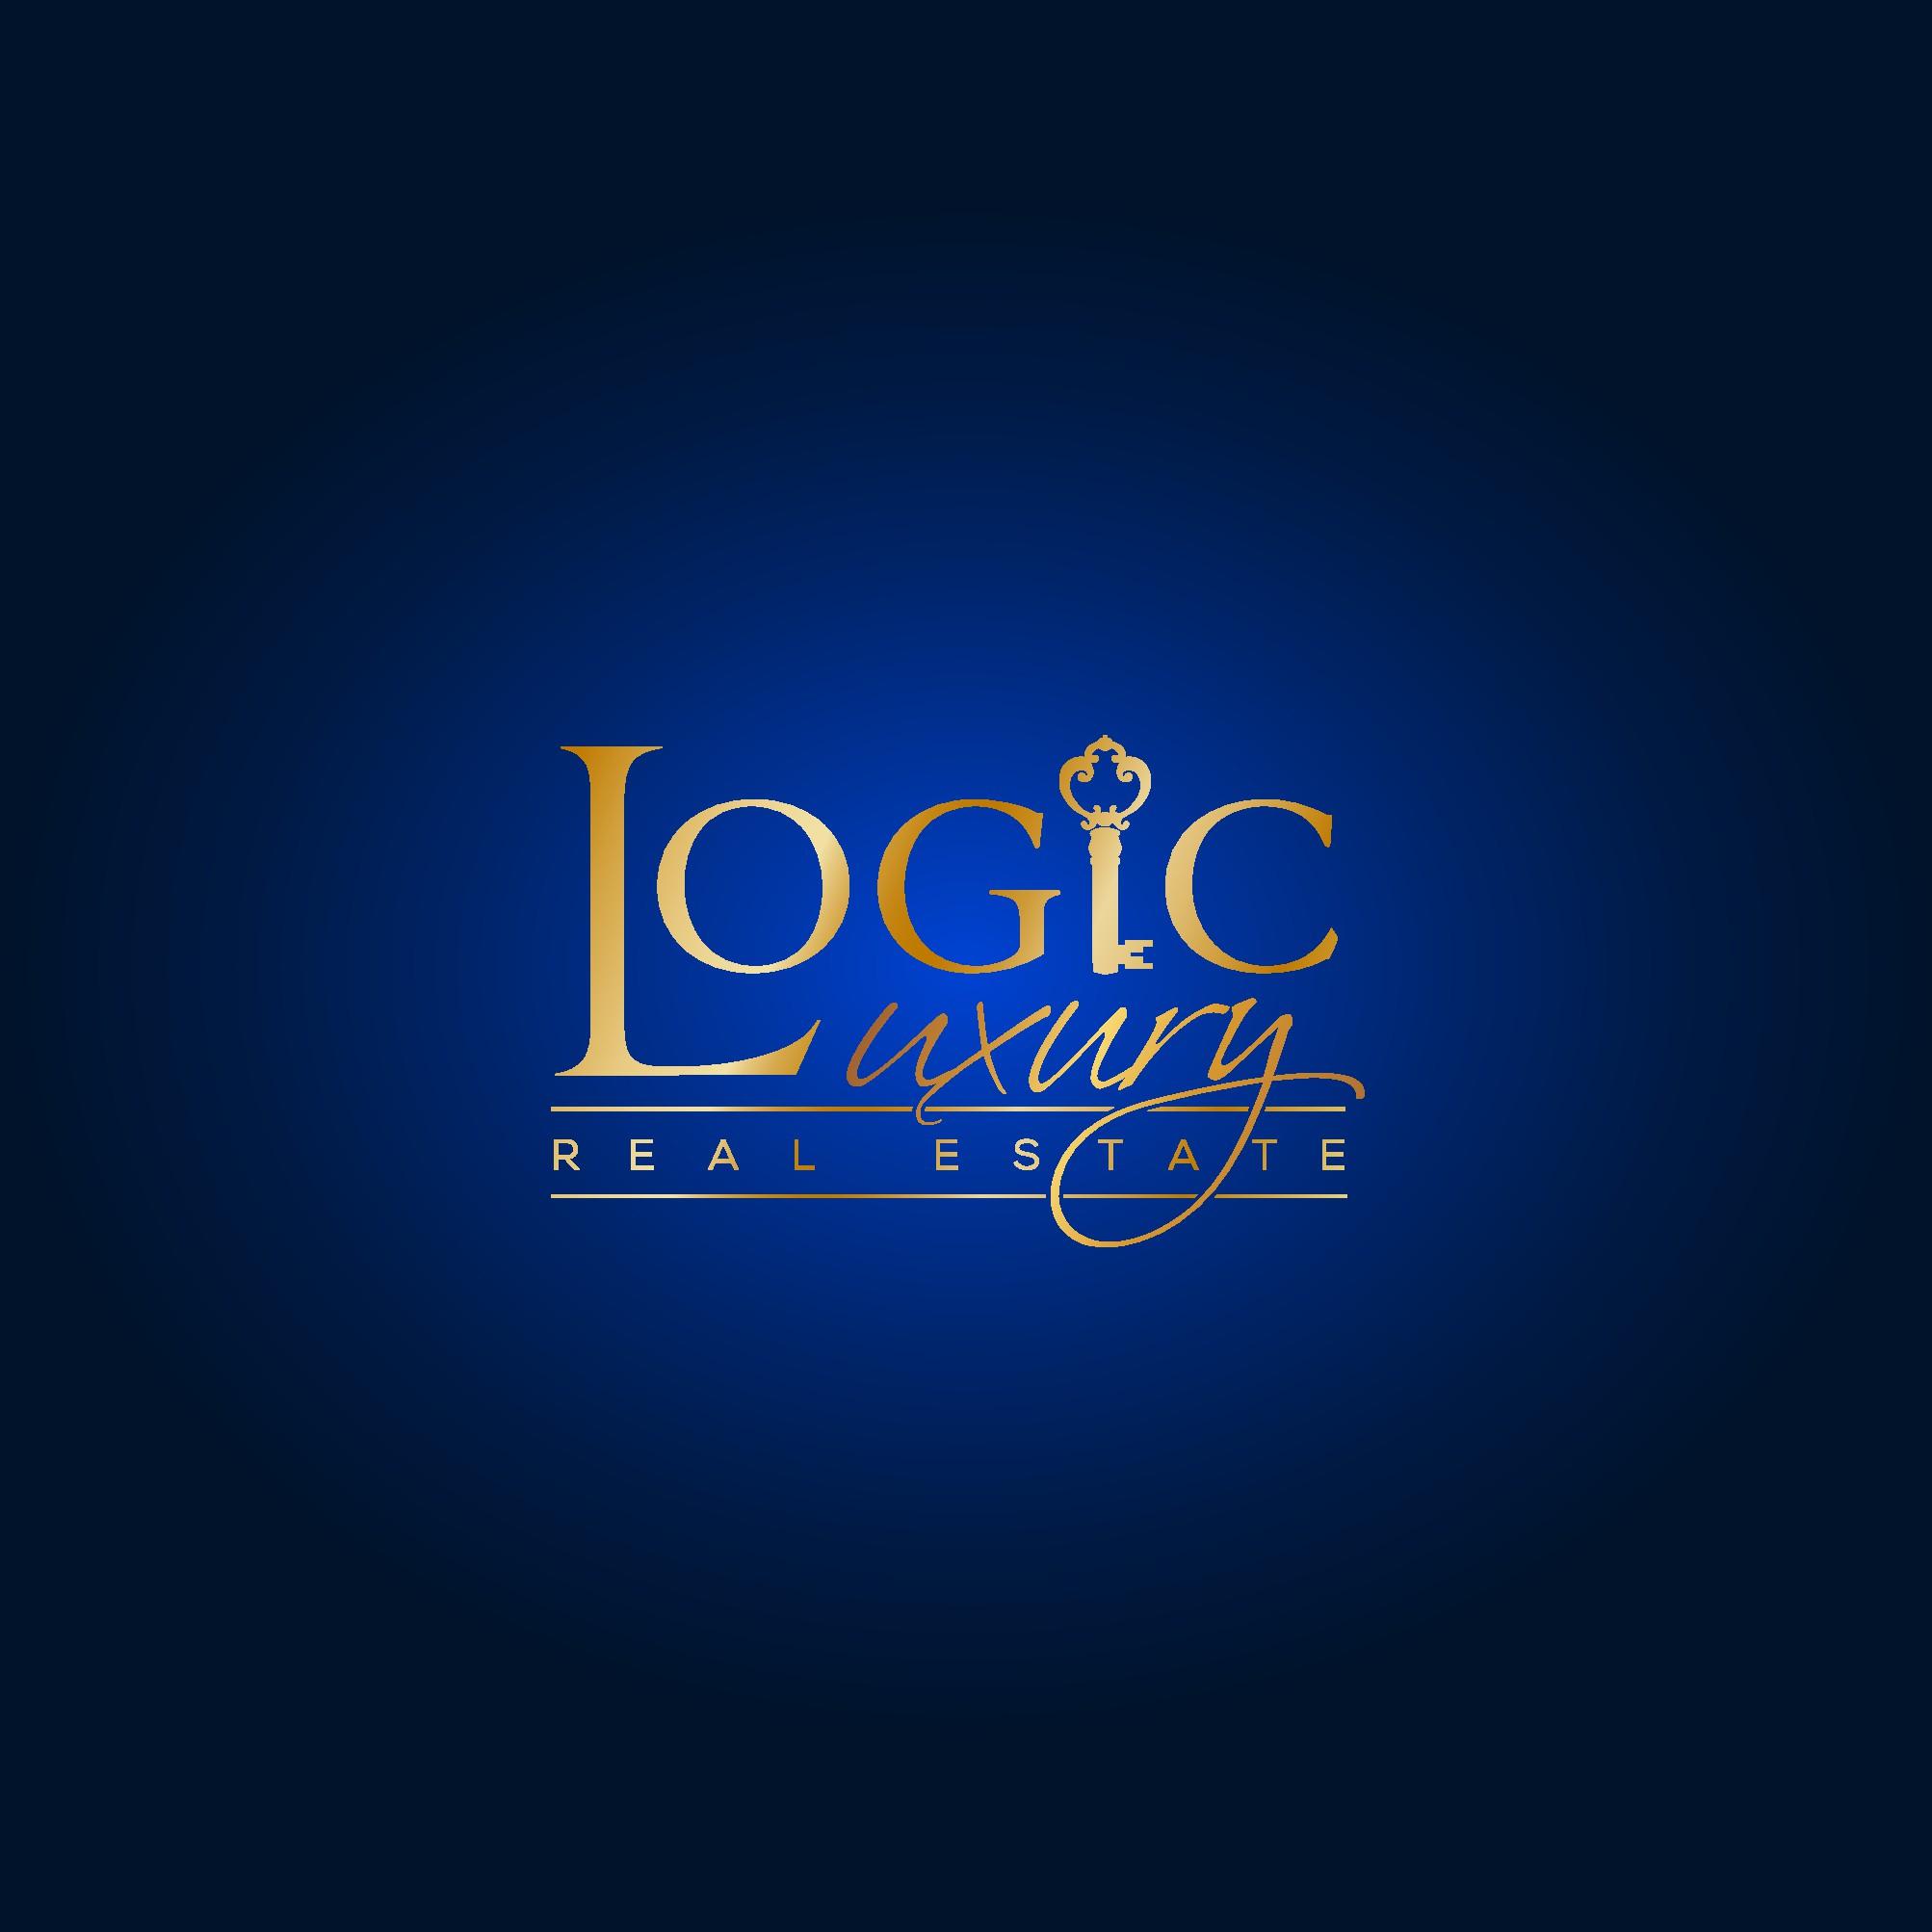 Logic Luxury Real Estate